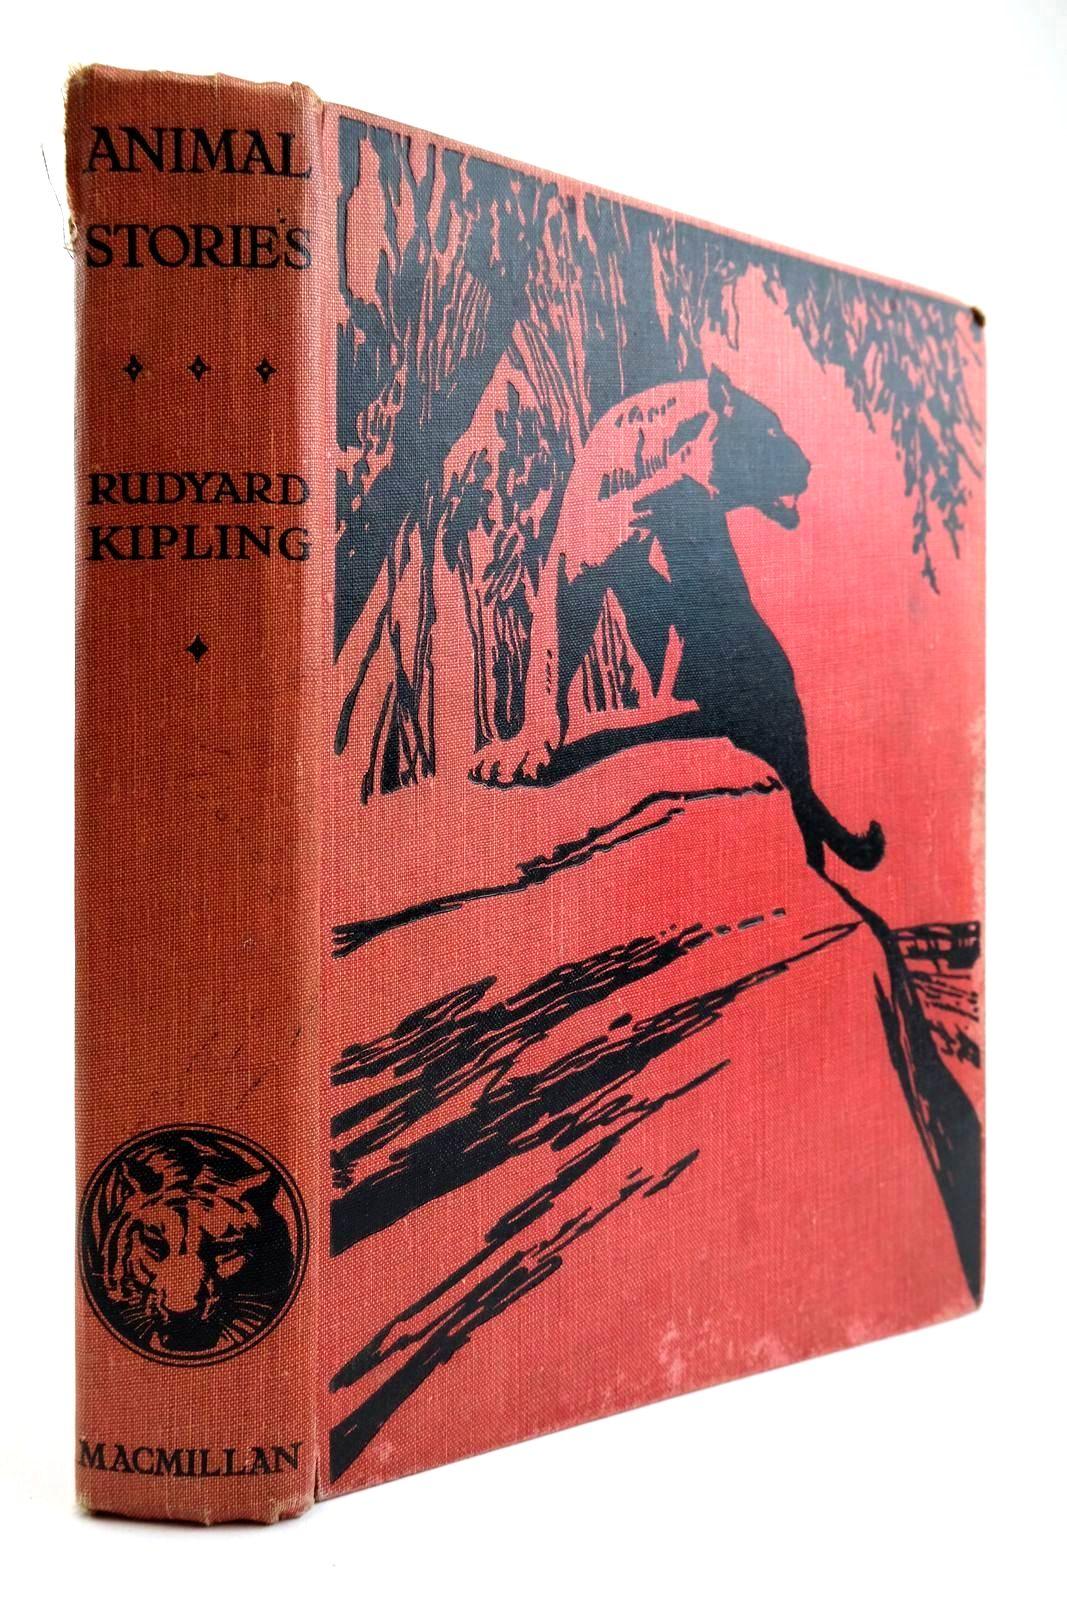 Photo of ANIMAL STORIES FROM RUDYARD KIPLING- Stock Number: 2133972